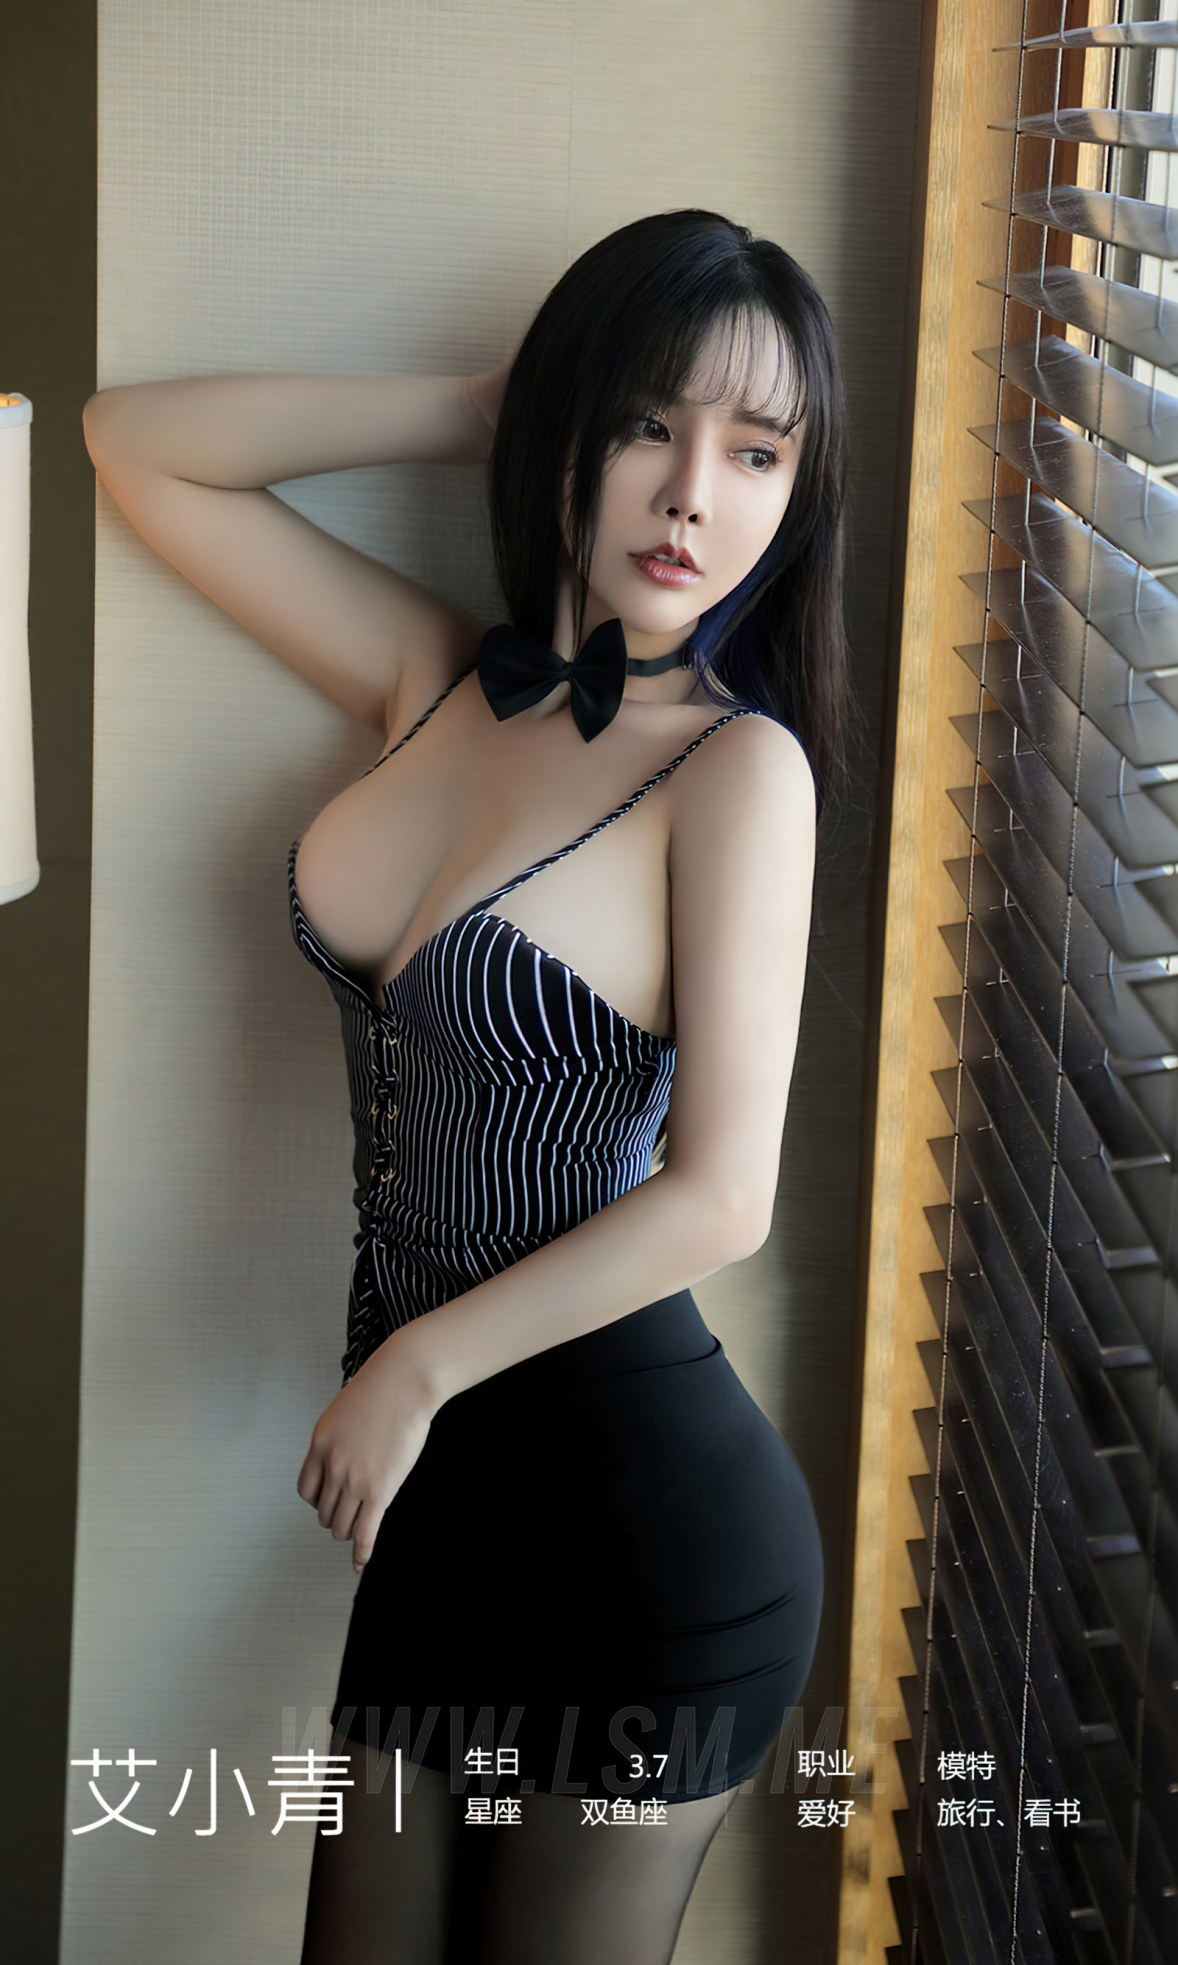 UGirls 爱尤物 No.2165  艾小青 黑桃协议 - 4